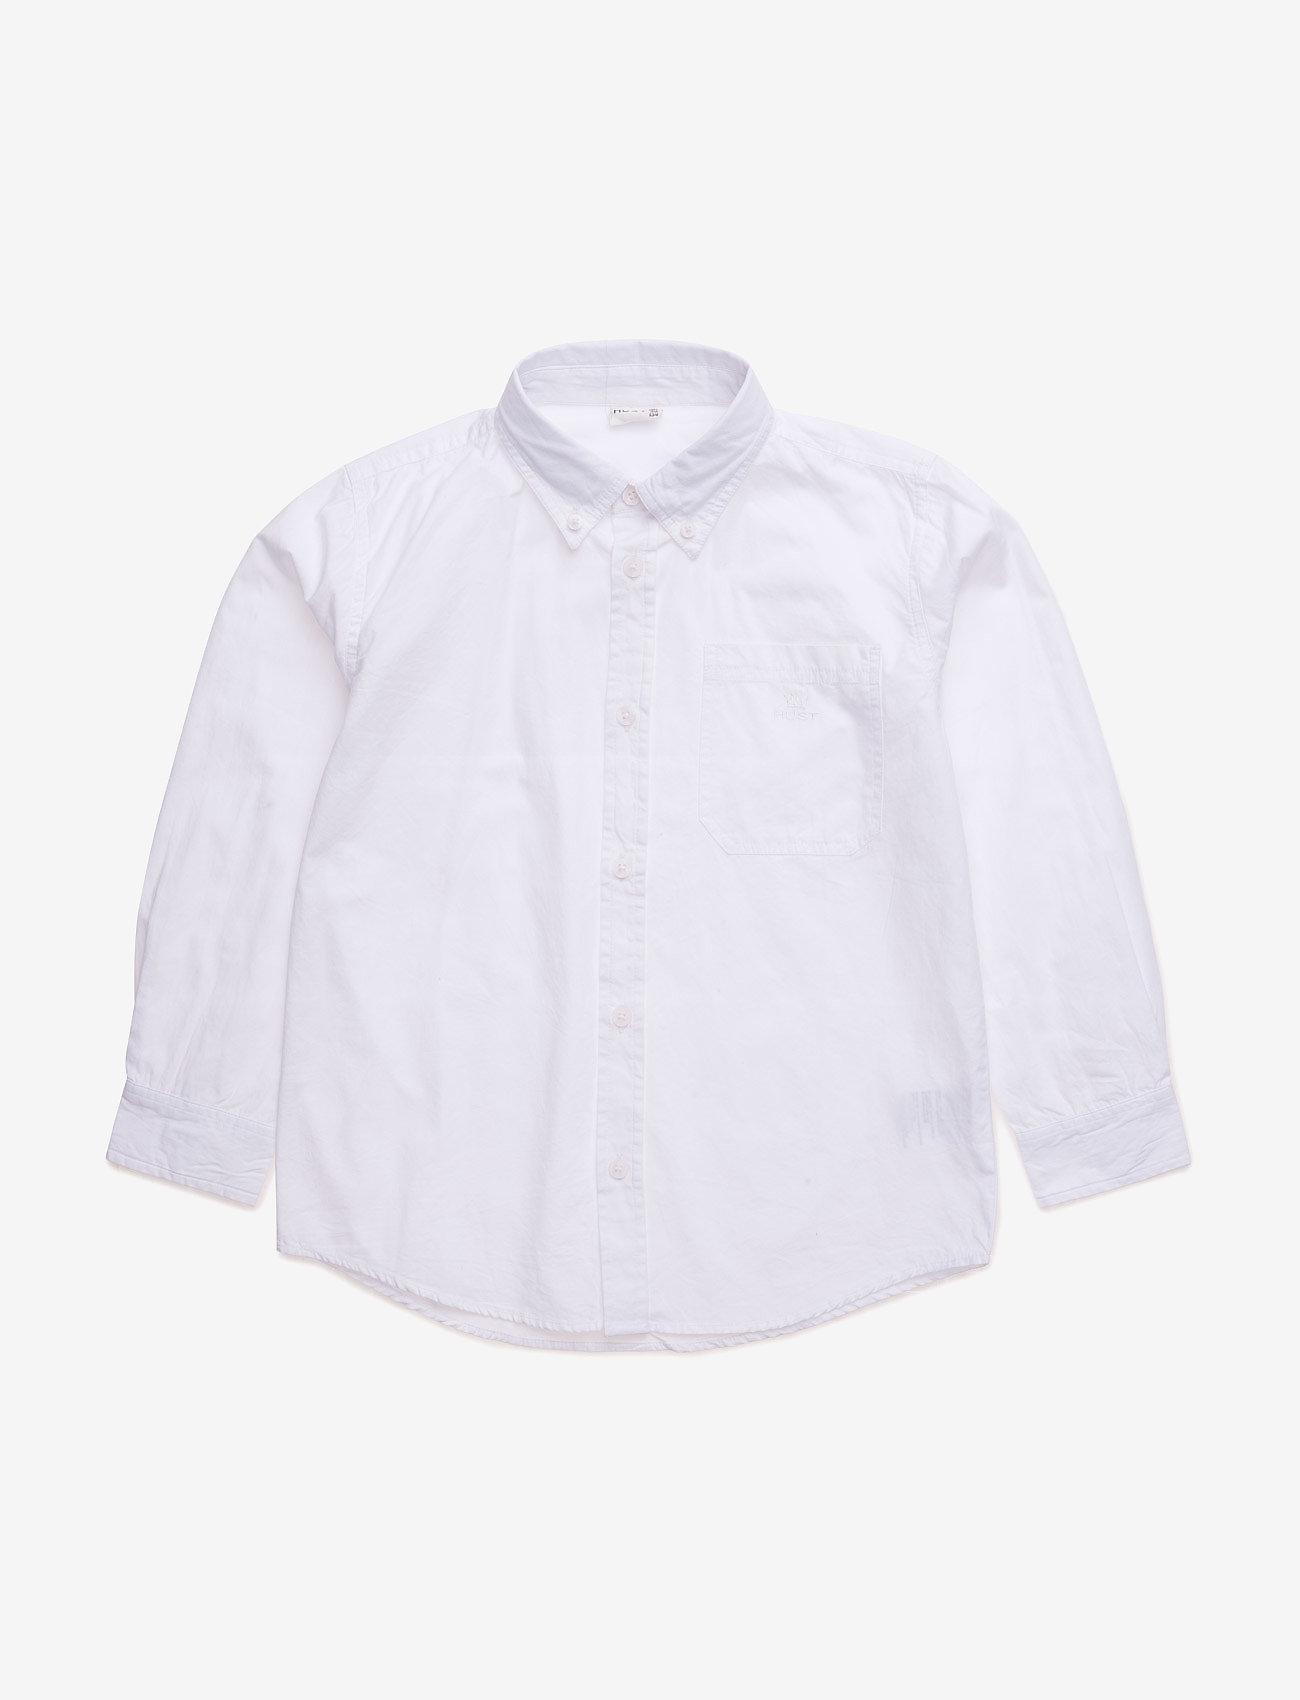 Hust & Claire - Shirt - shirts - white - 0